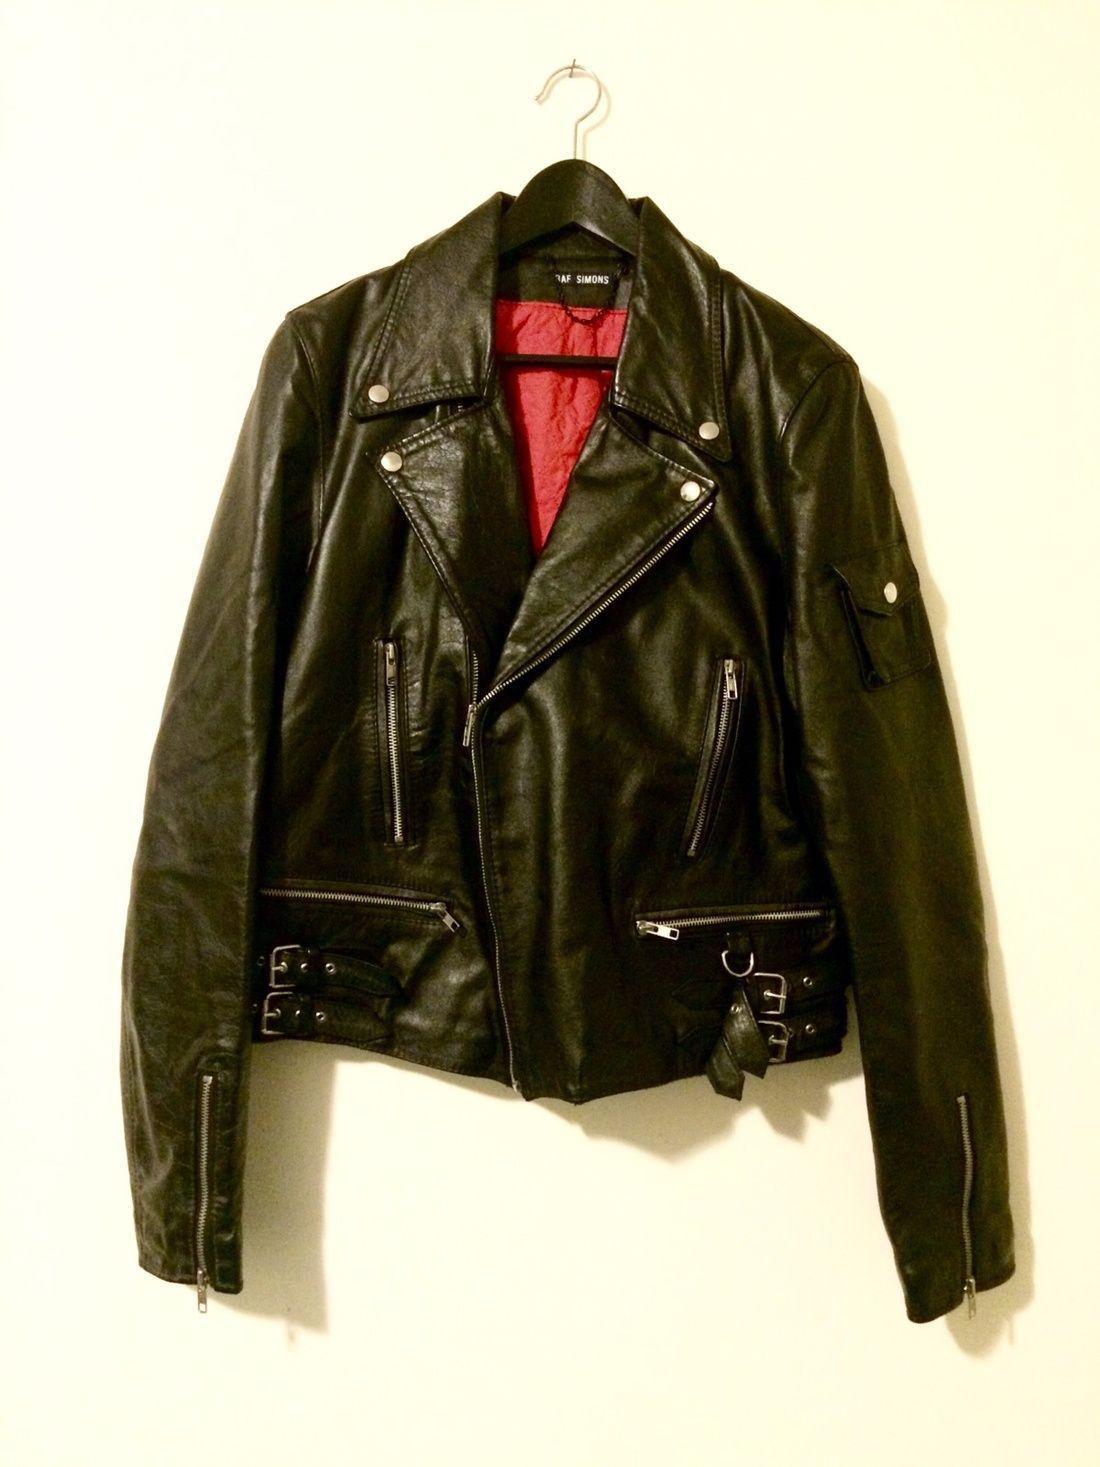 e6358395eb Raf Simons Aw97 Leather Motorcycle Jacket